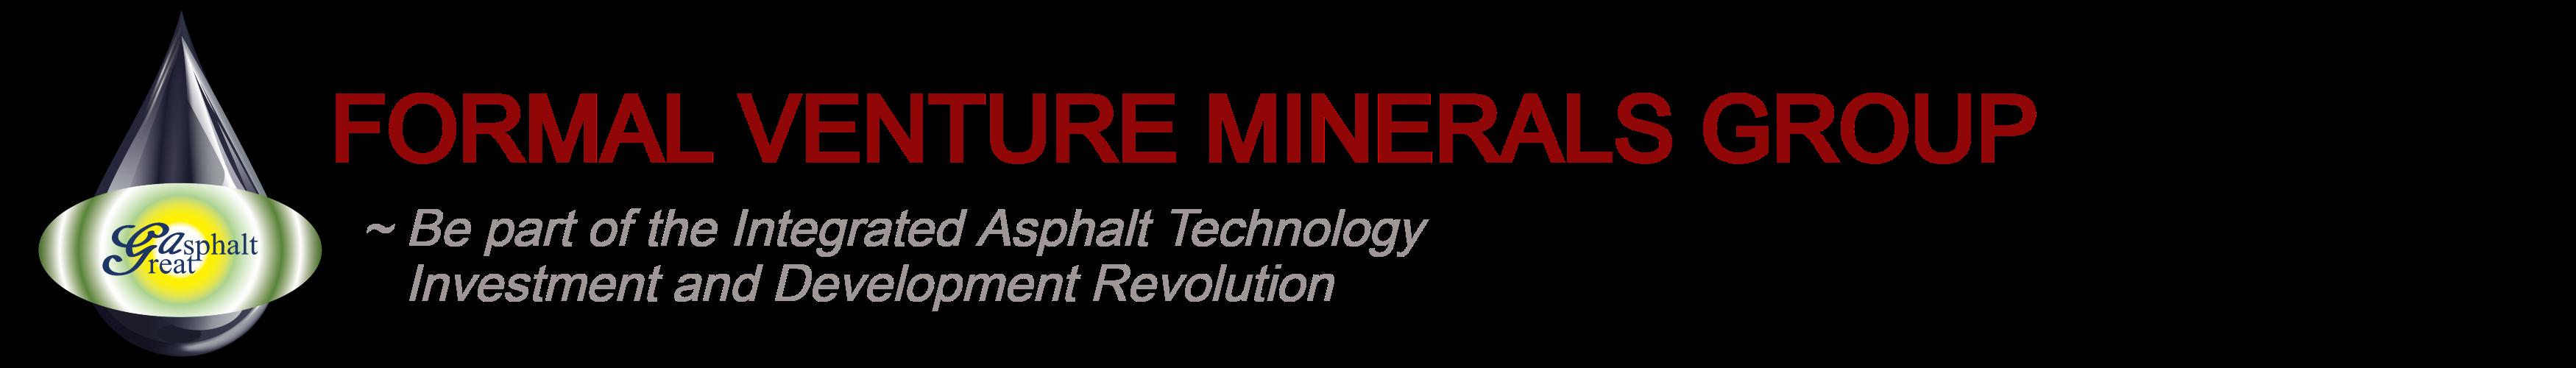 Beijing E Solvent Technologies Corporation